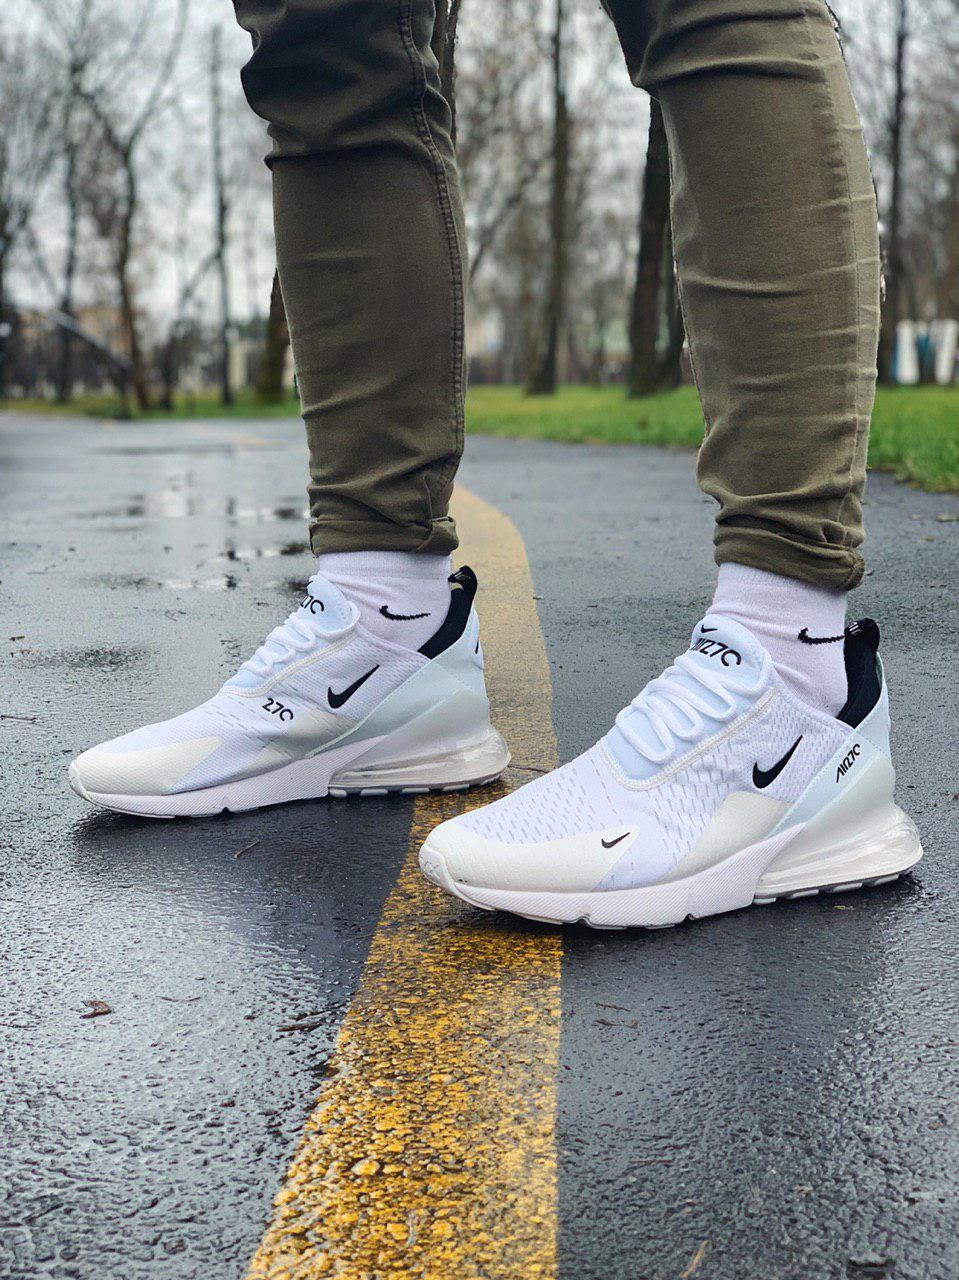 Кроссовки Nike Air Max 270 Найк Аир Макс